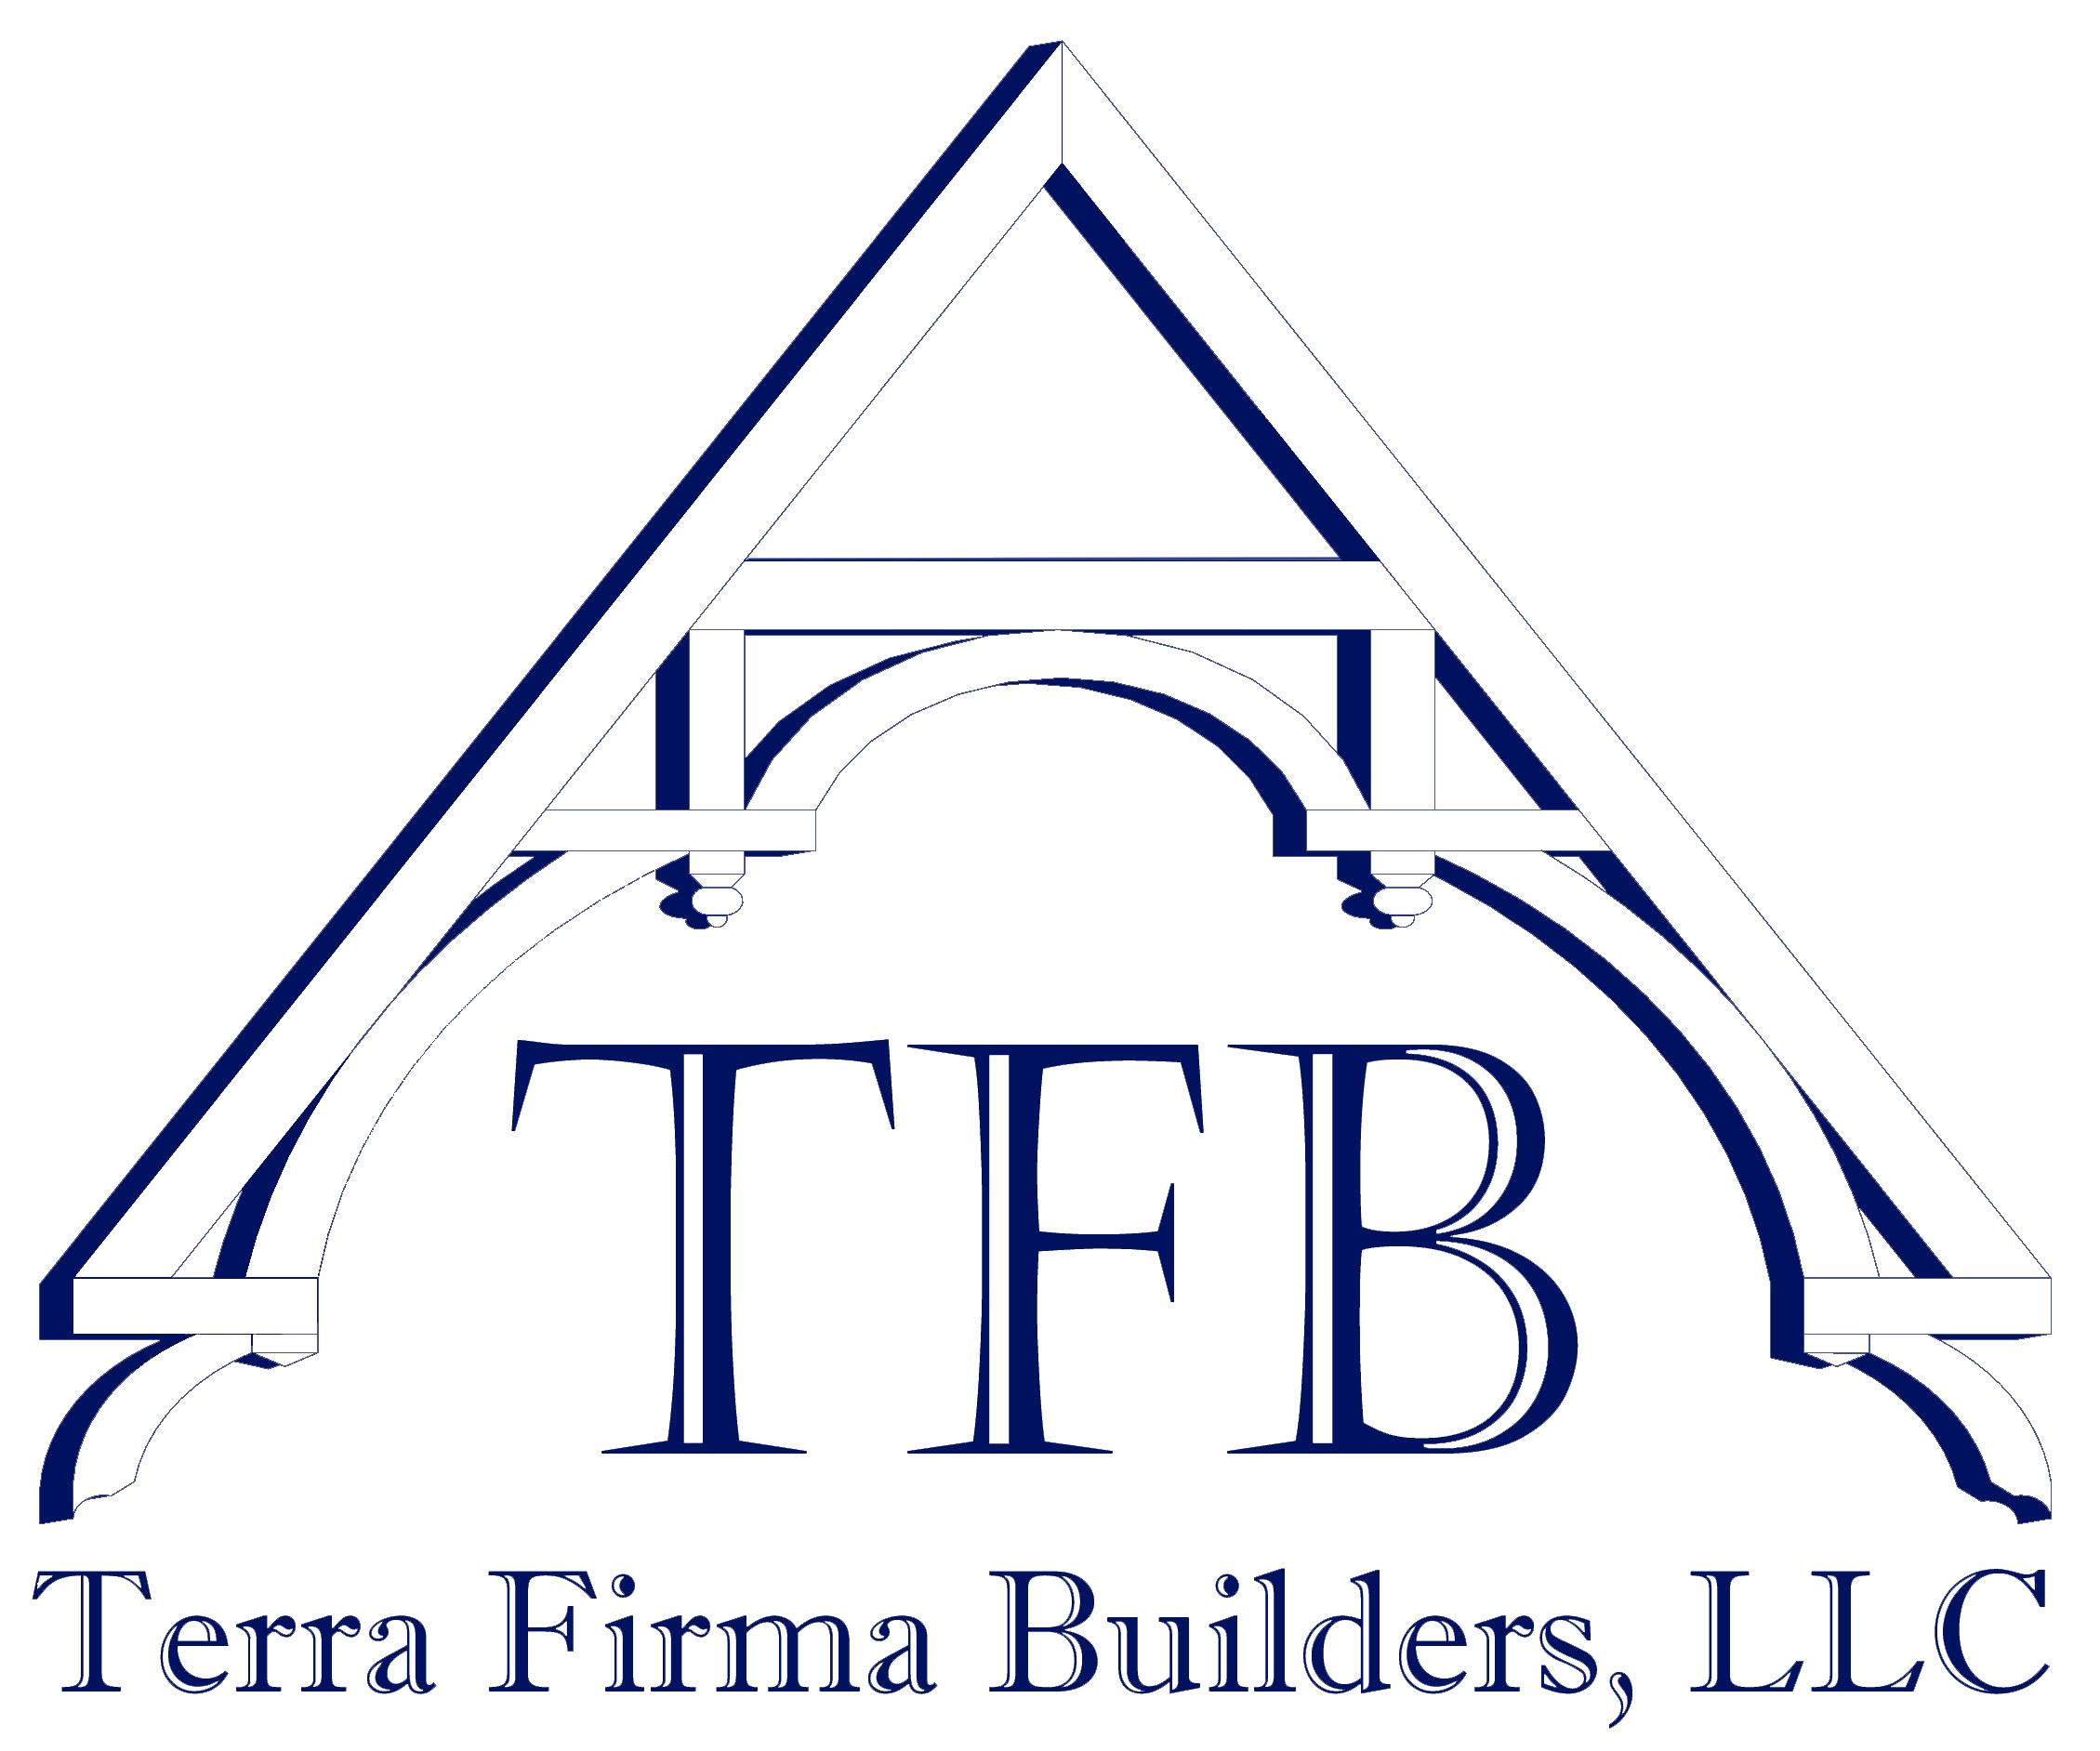 Terra Firma Builders, LLC